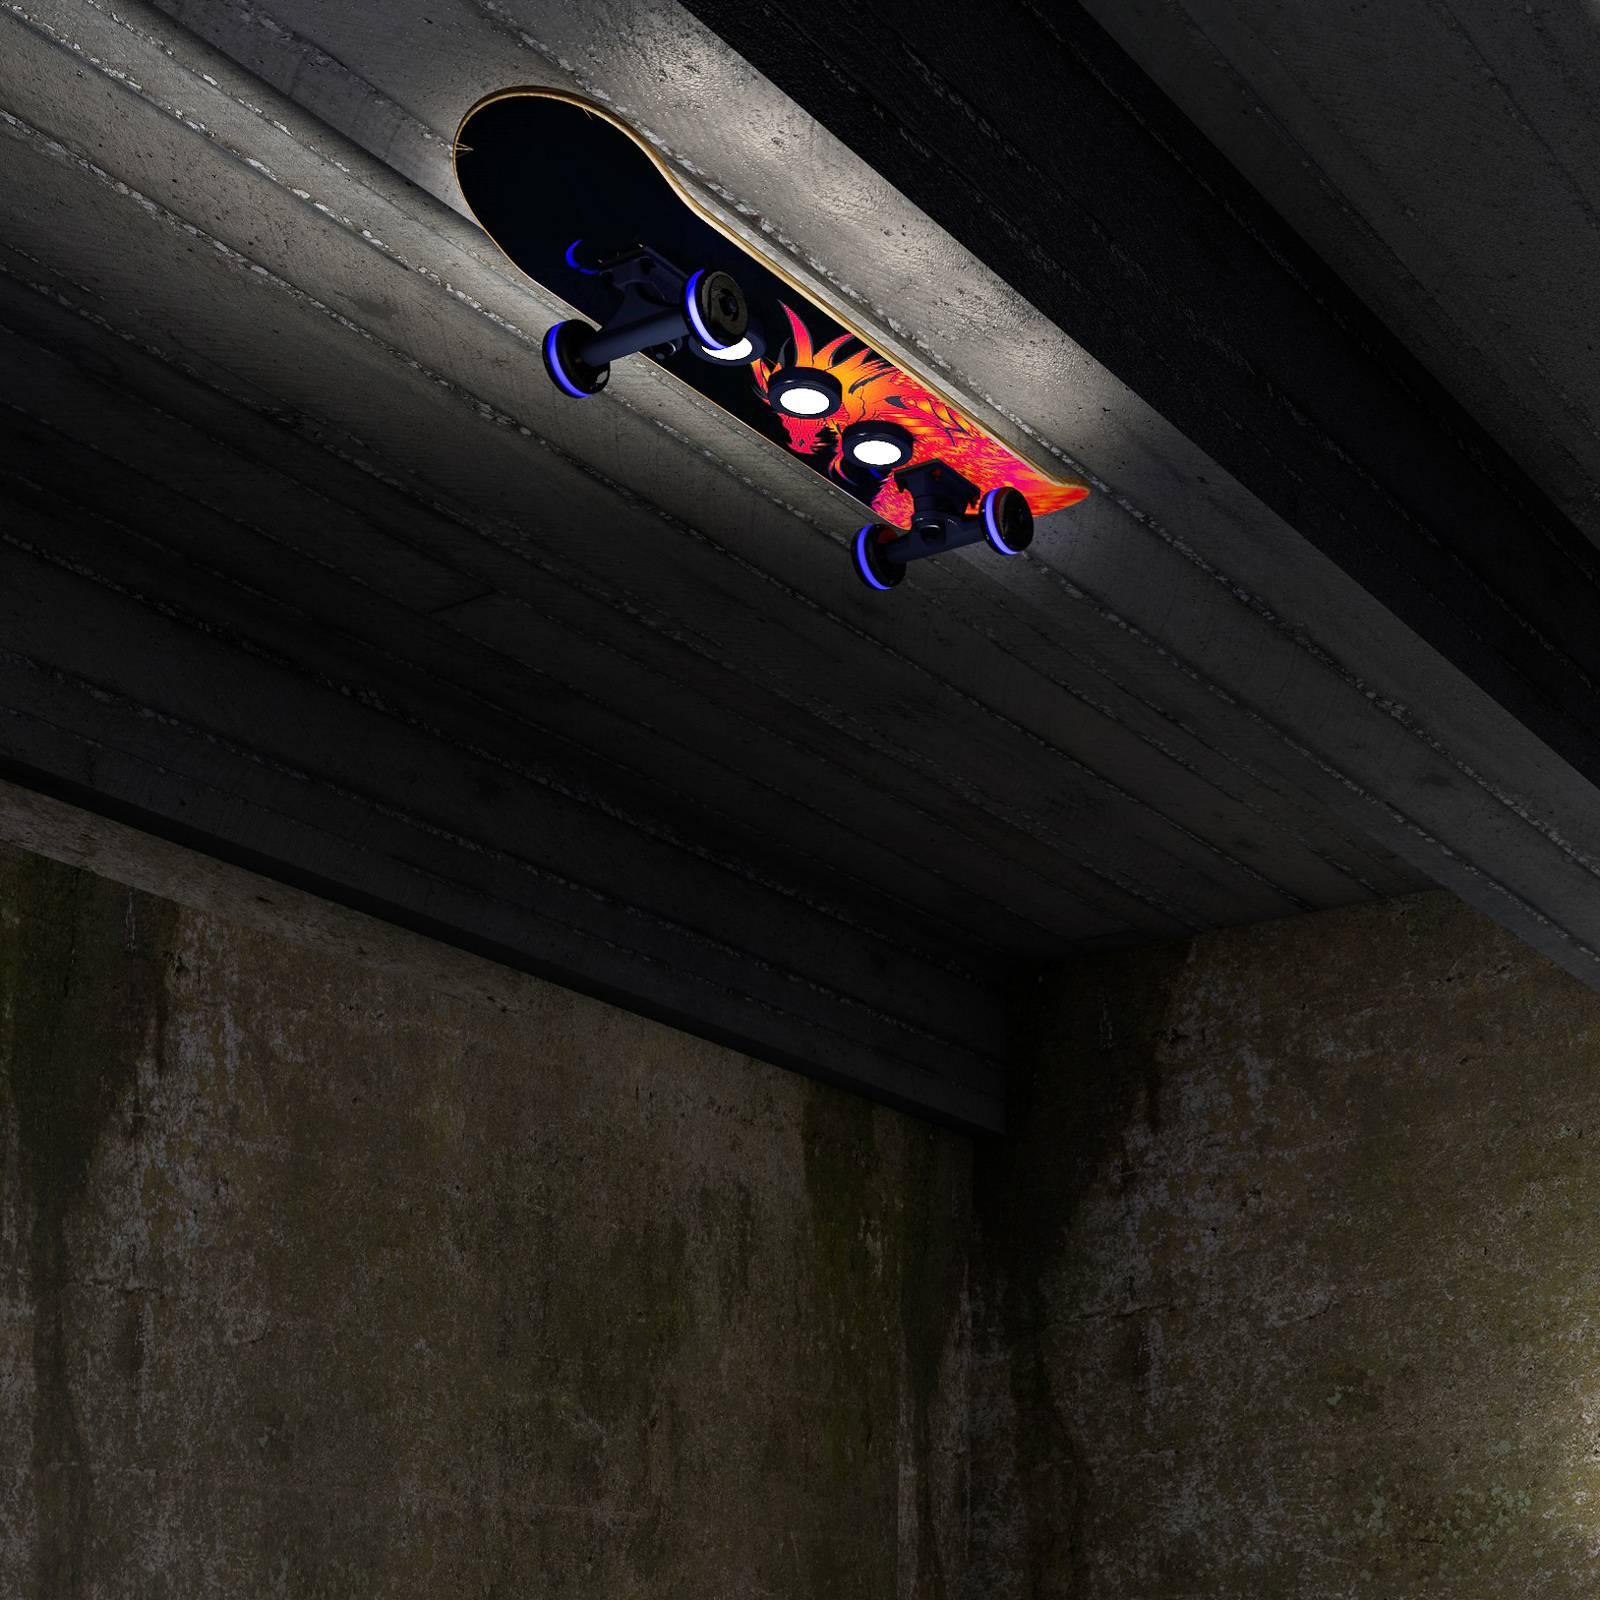 Kattovalaisin Skateboard Easy Cruiser Dragon, RGBW